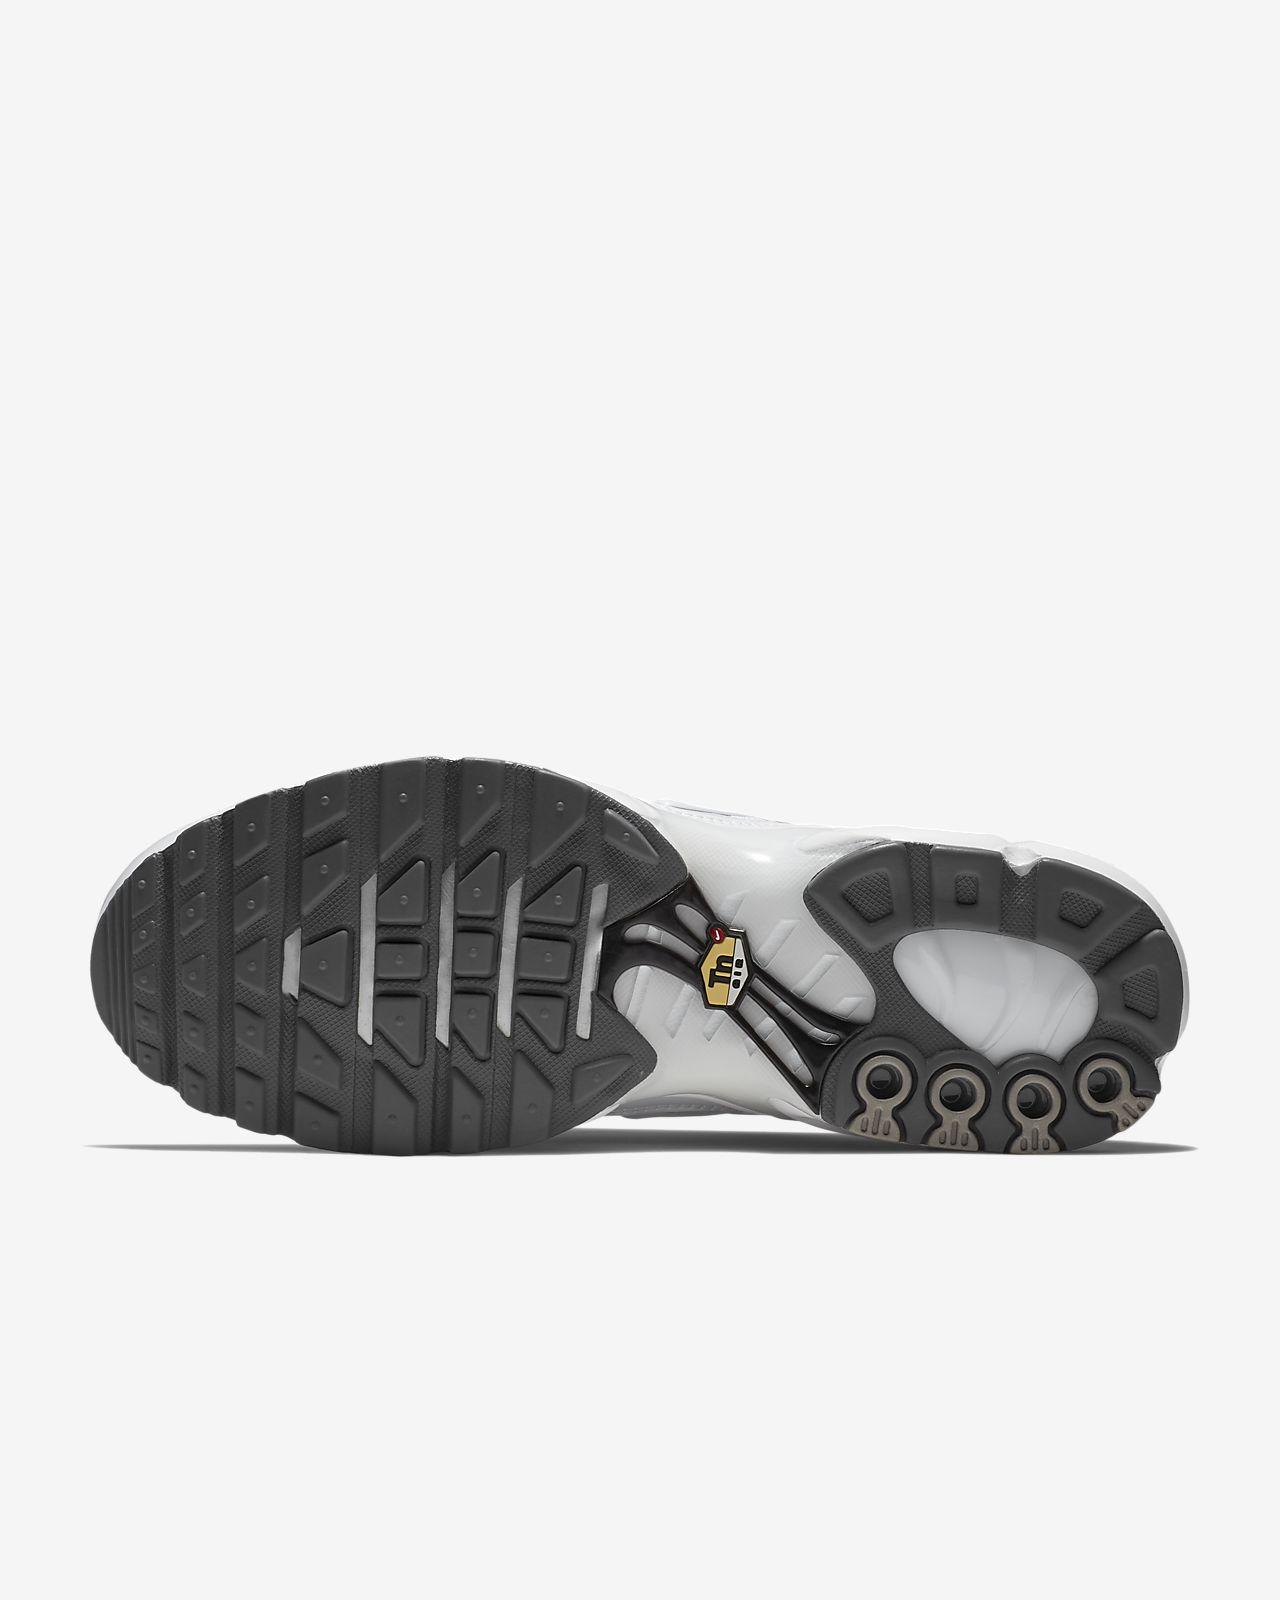 air max plus shoes